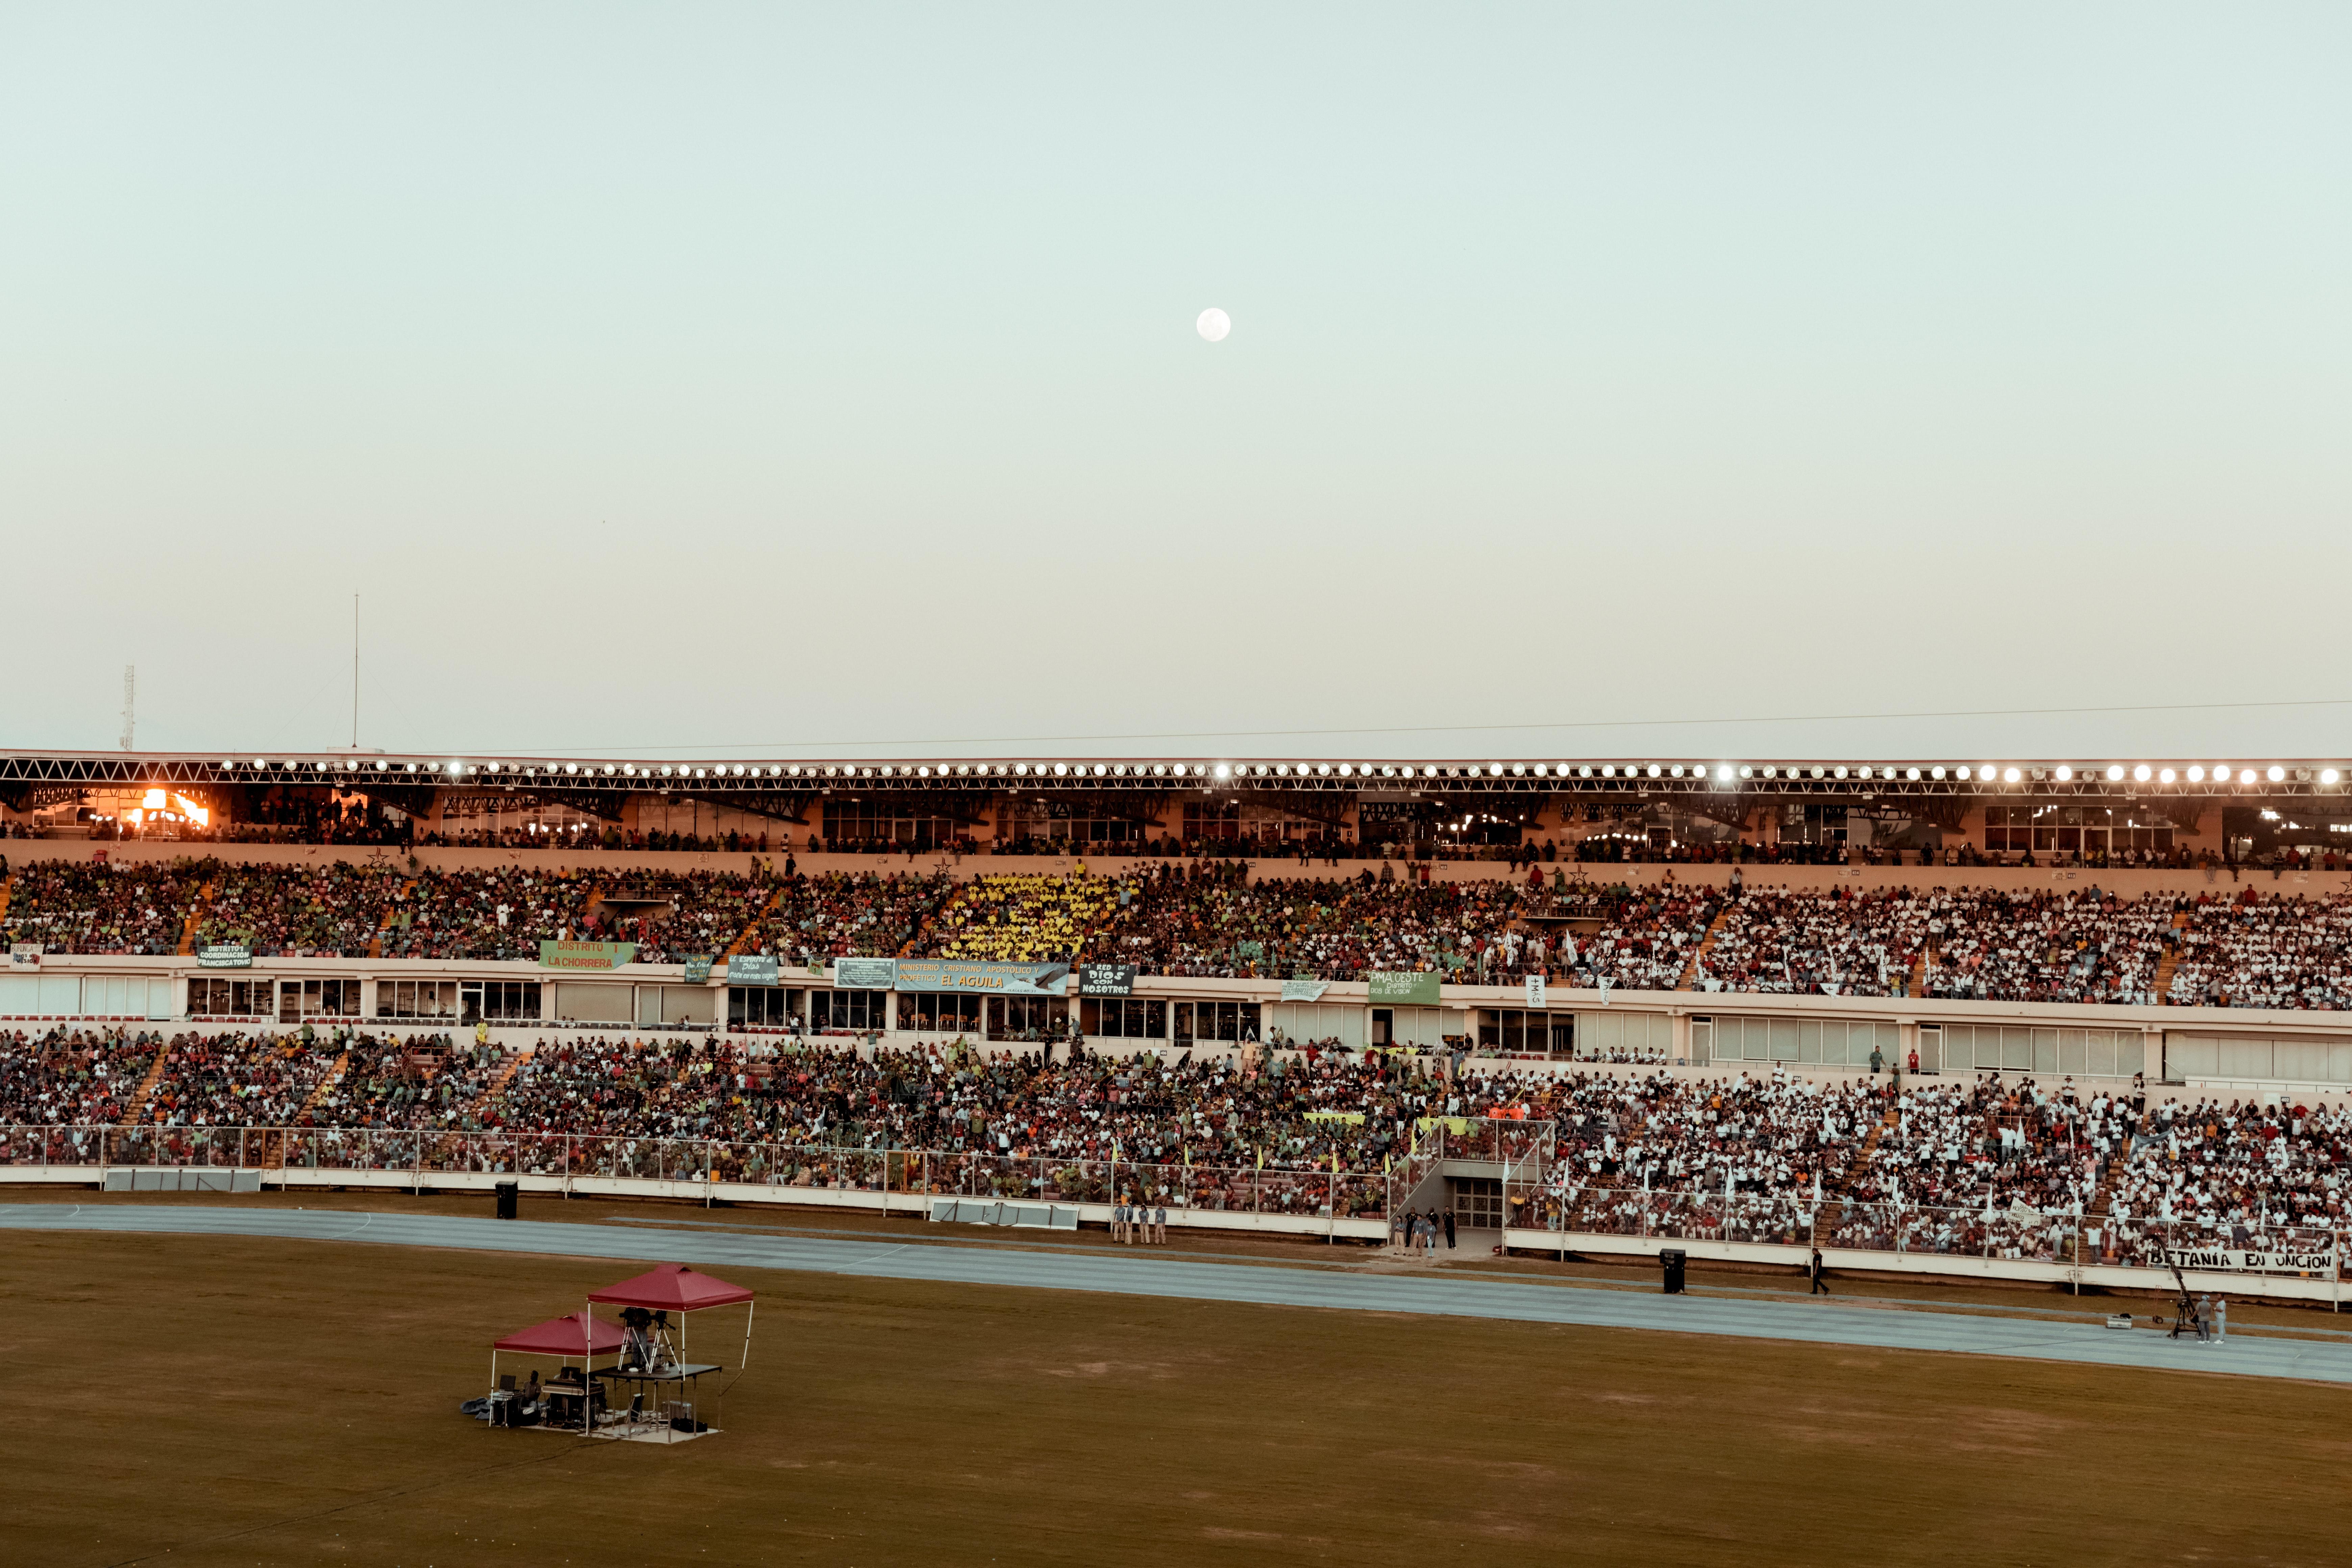 photo of stadium during dawn